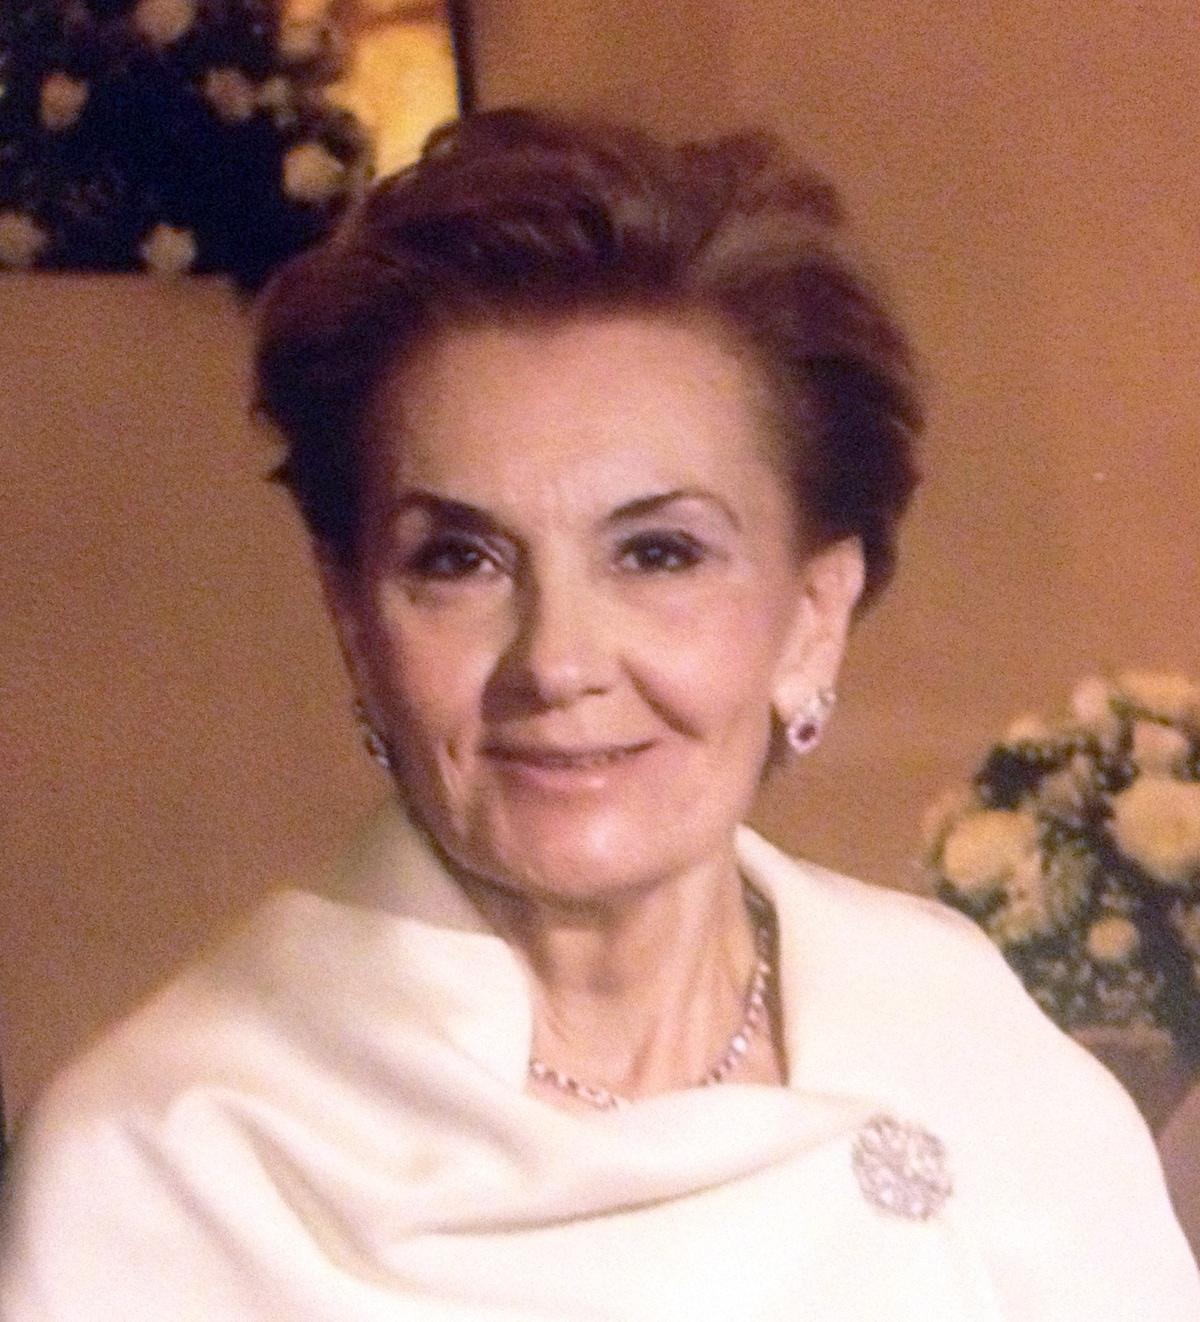 Rosanna from Venice